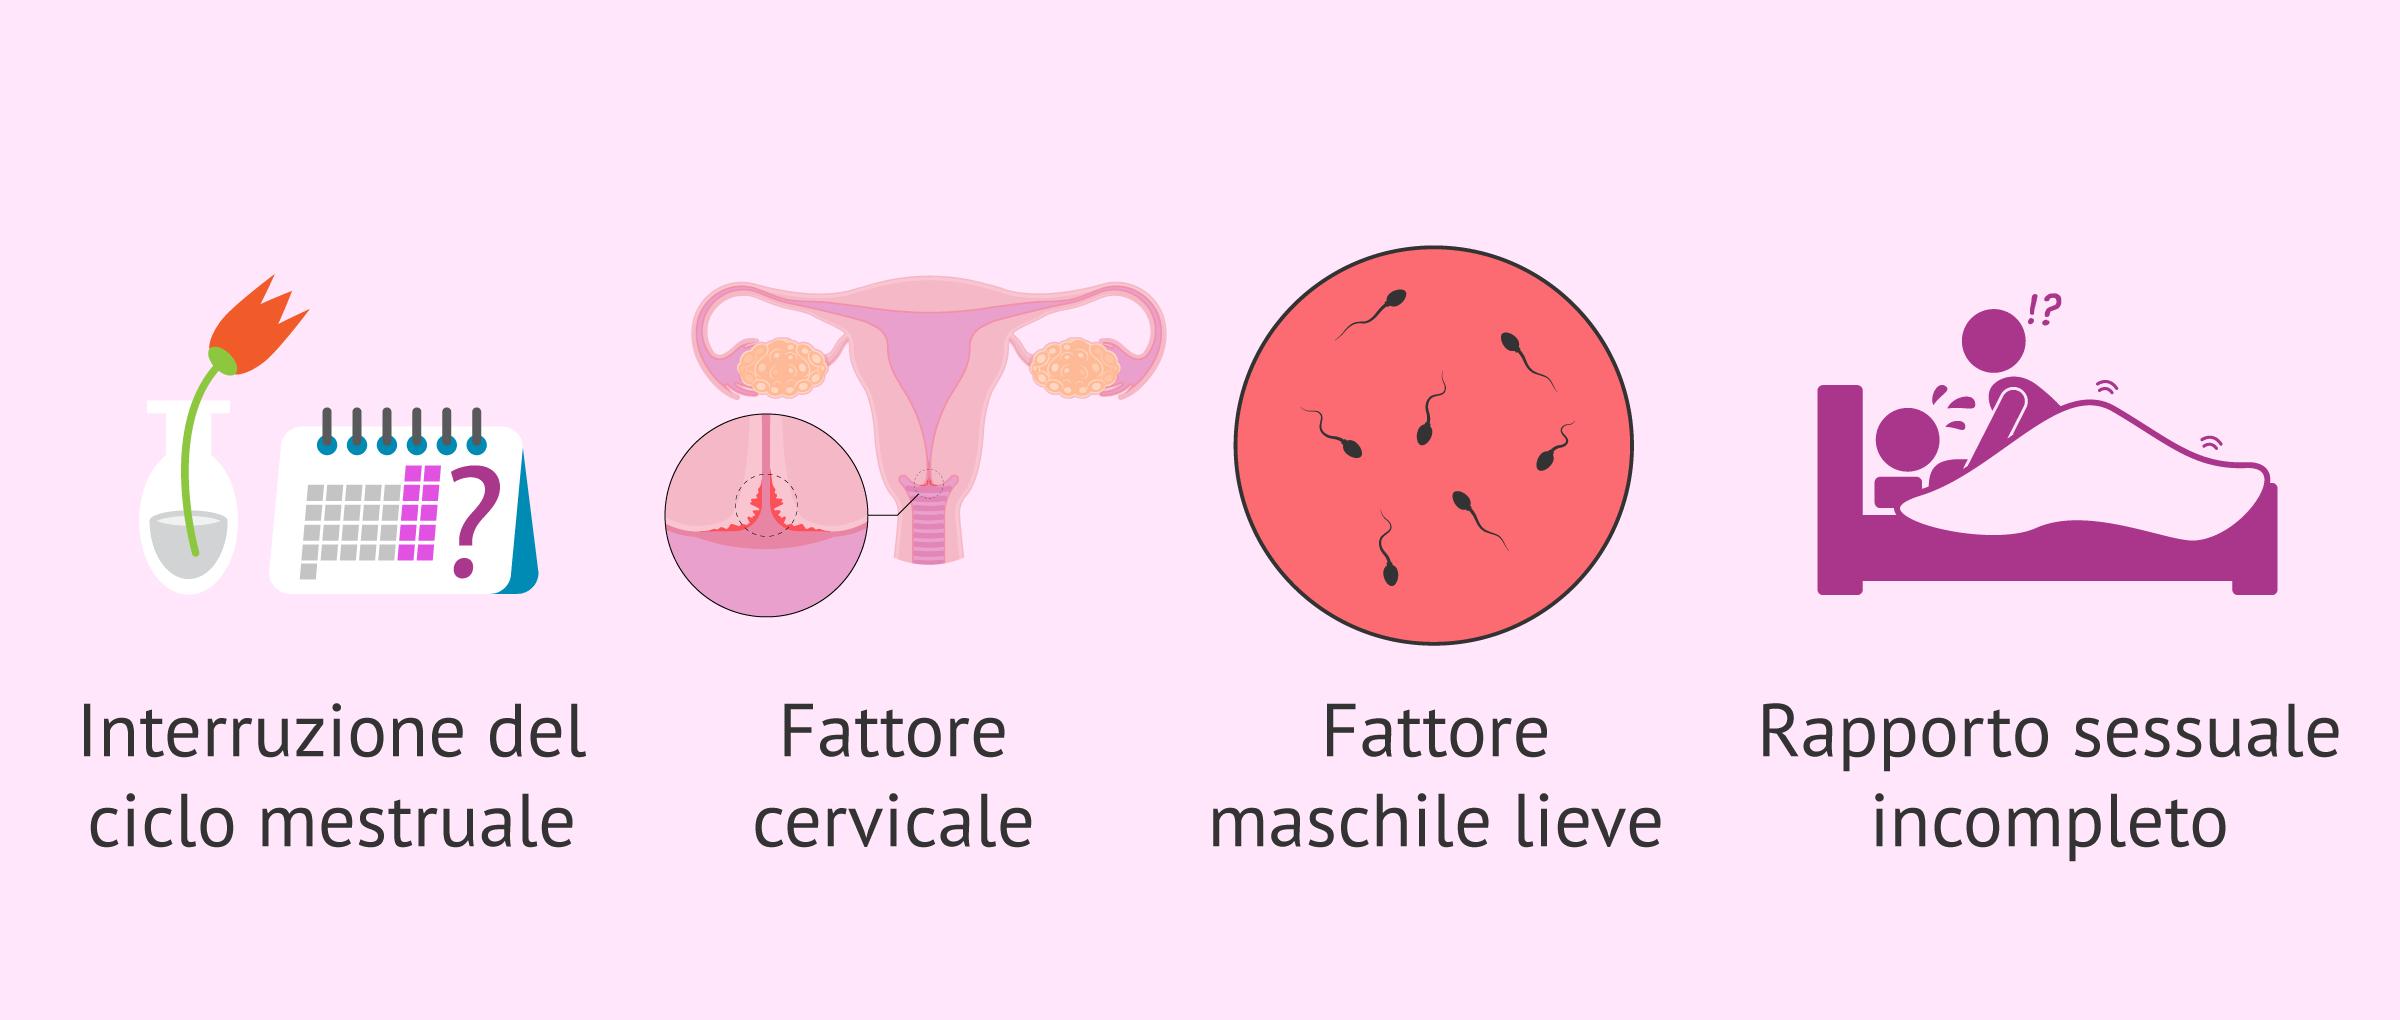 Imagen: Spermatozoi colorati